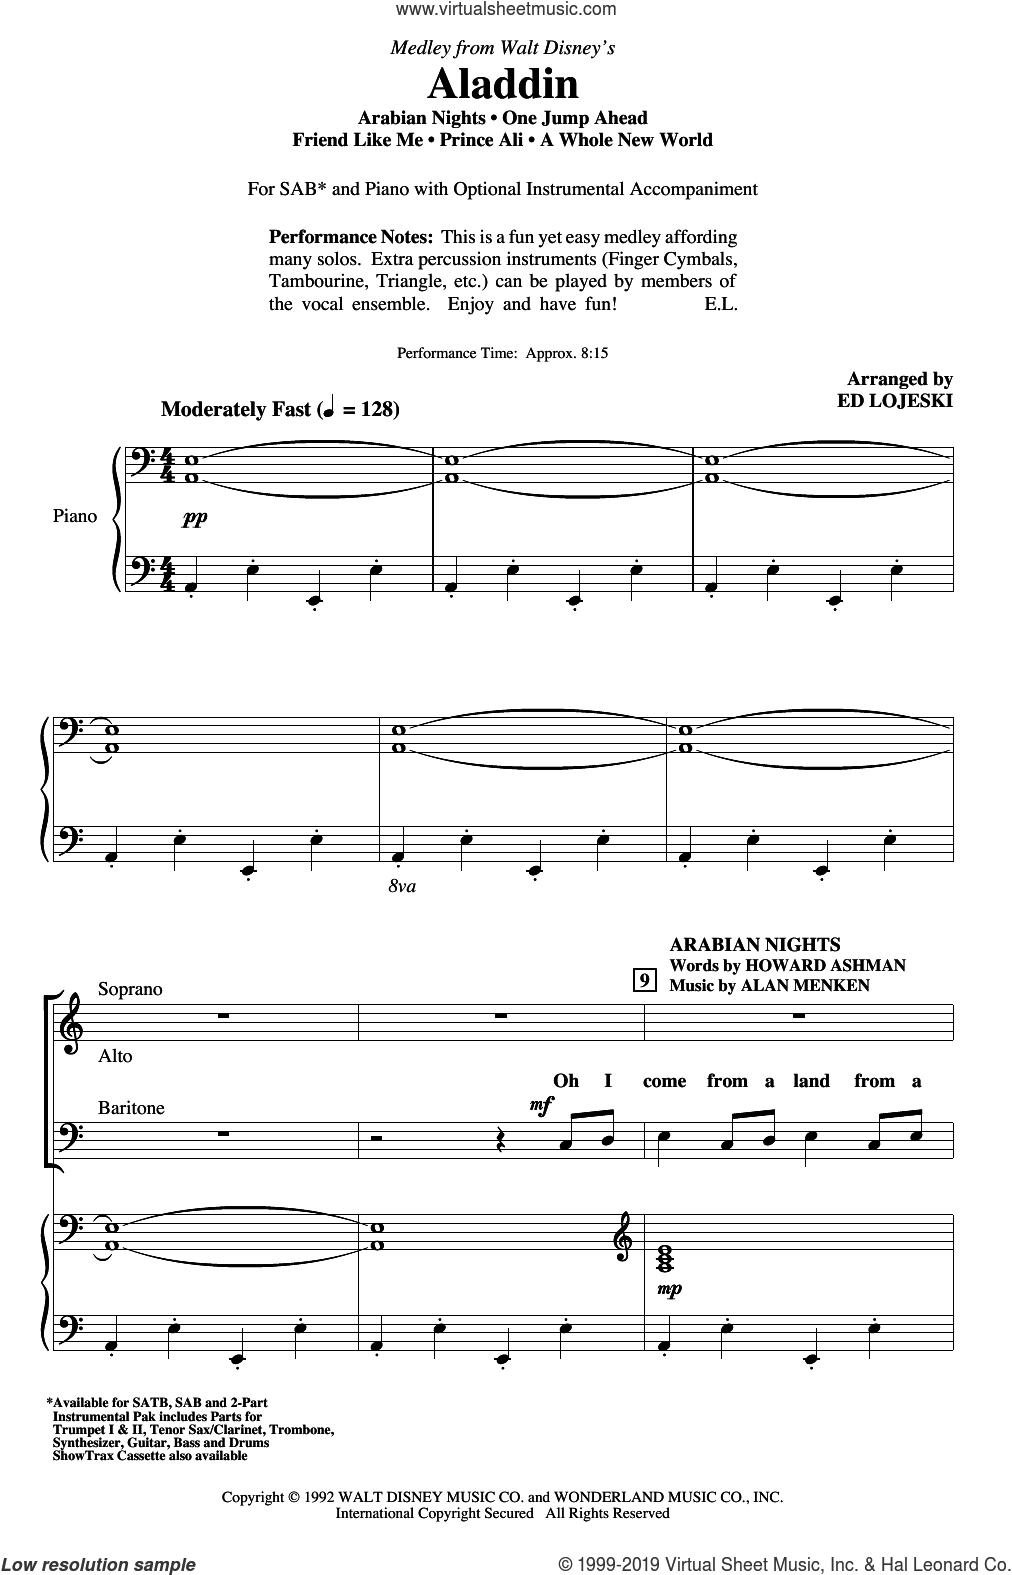 Aladdin (Medley) (from Disney's Aladdin) (arr. Ed Lojeski) sheet music for choir (SAB: soprano, alto, bass) by Alan Menken, Ed Lojeski, Howard Ashman and Tim Rice, intermediate skill level